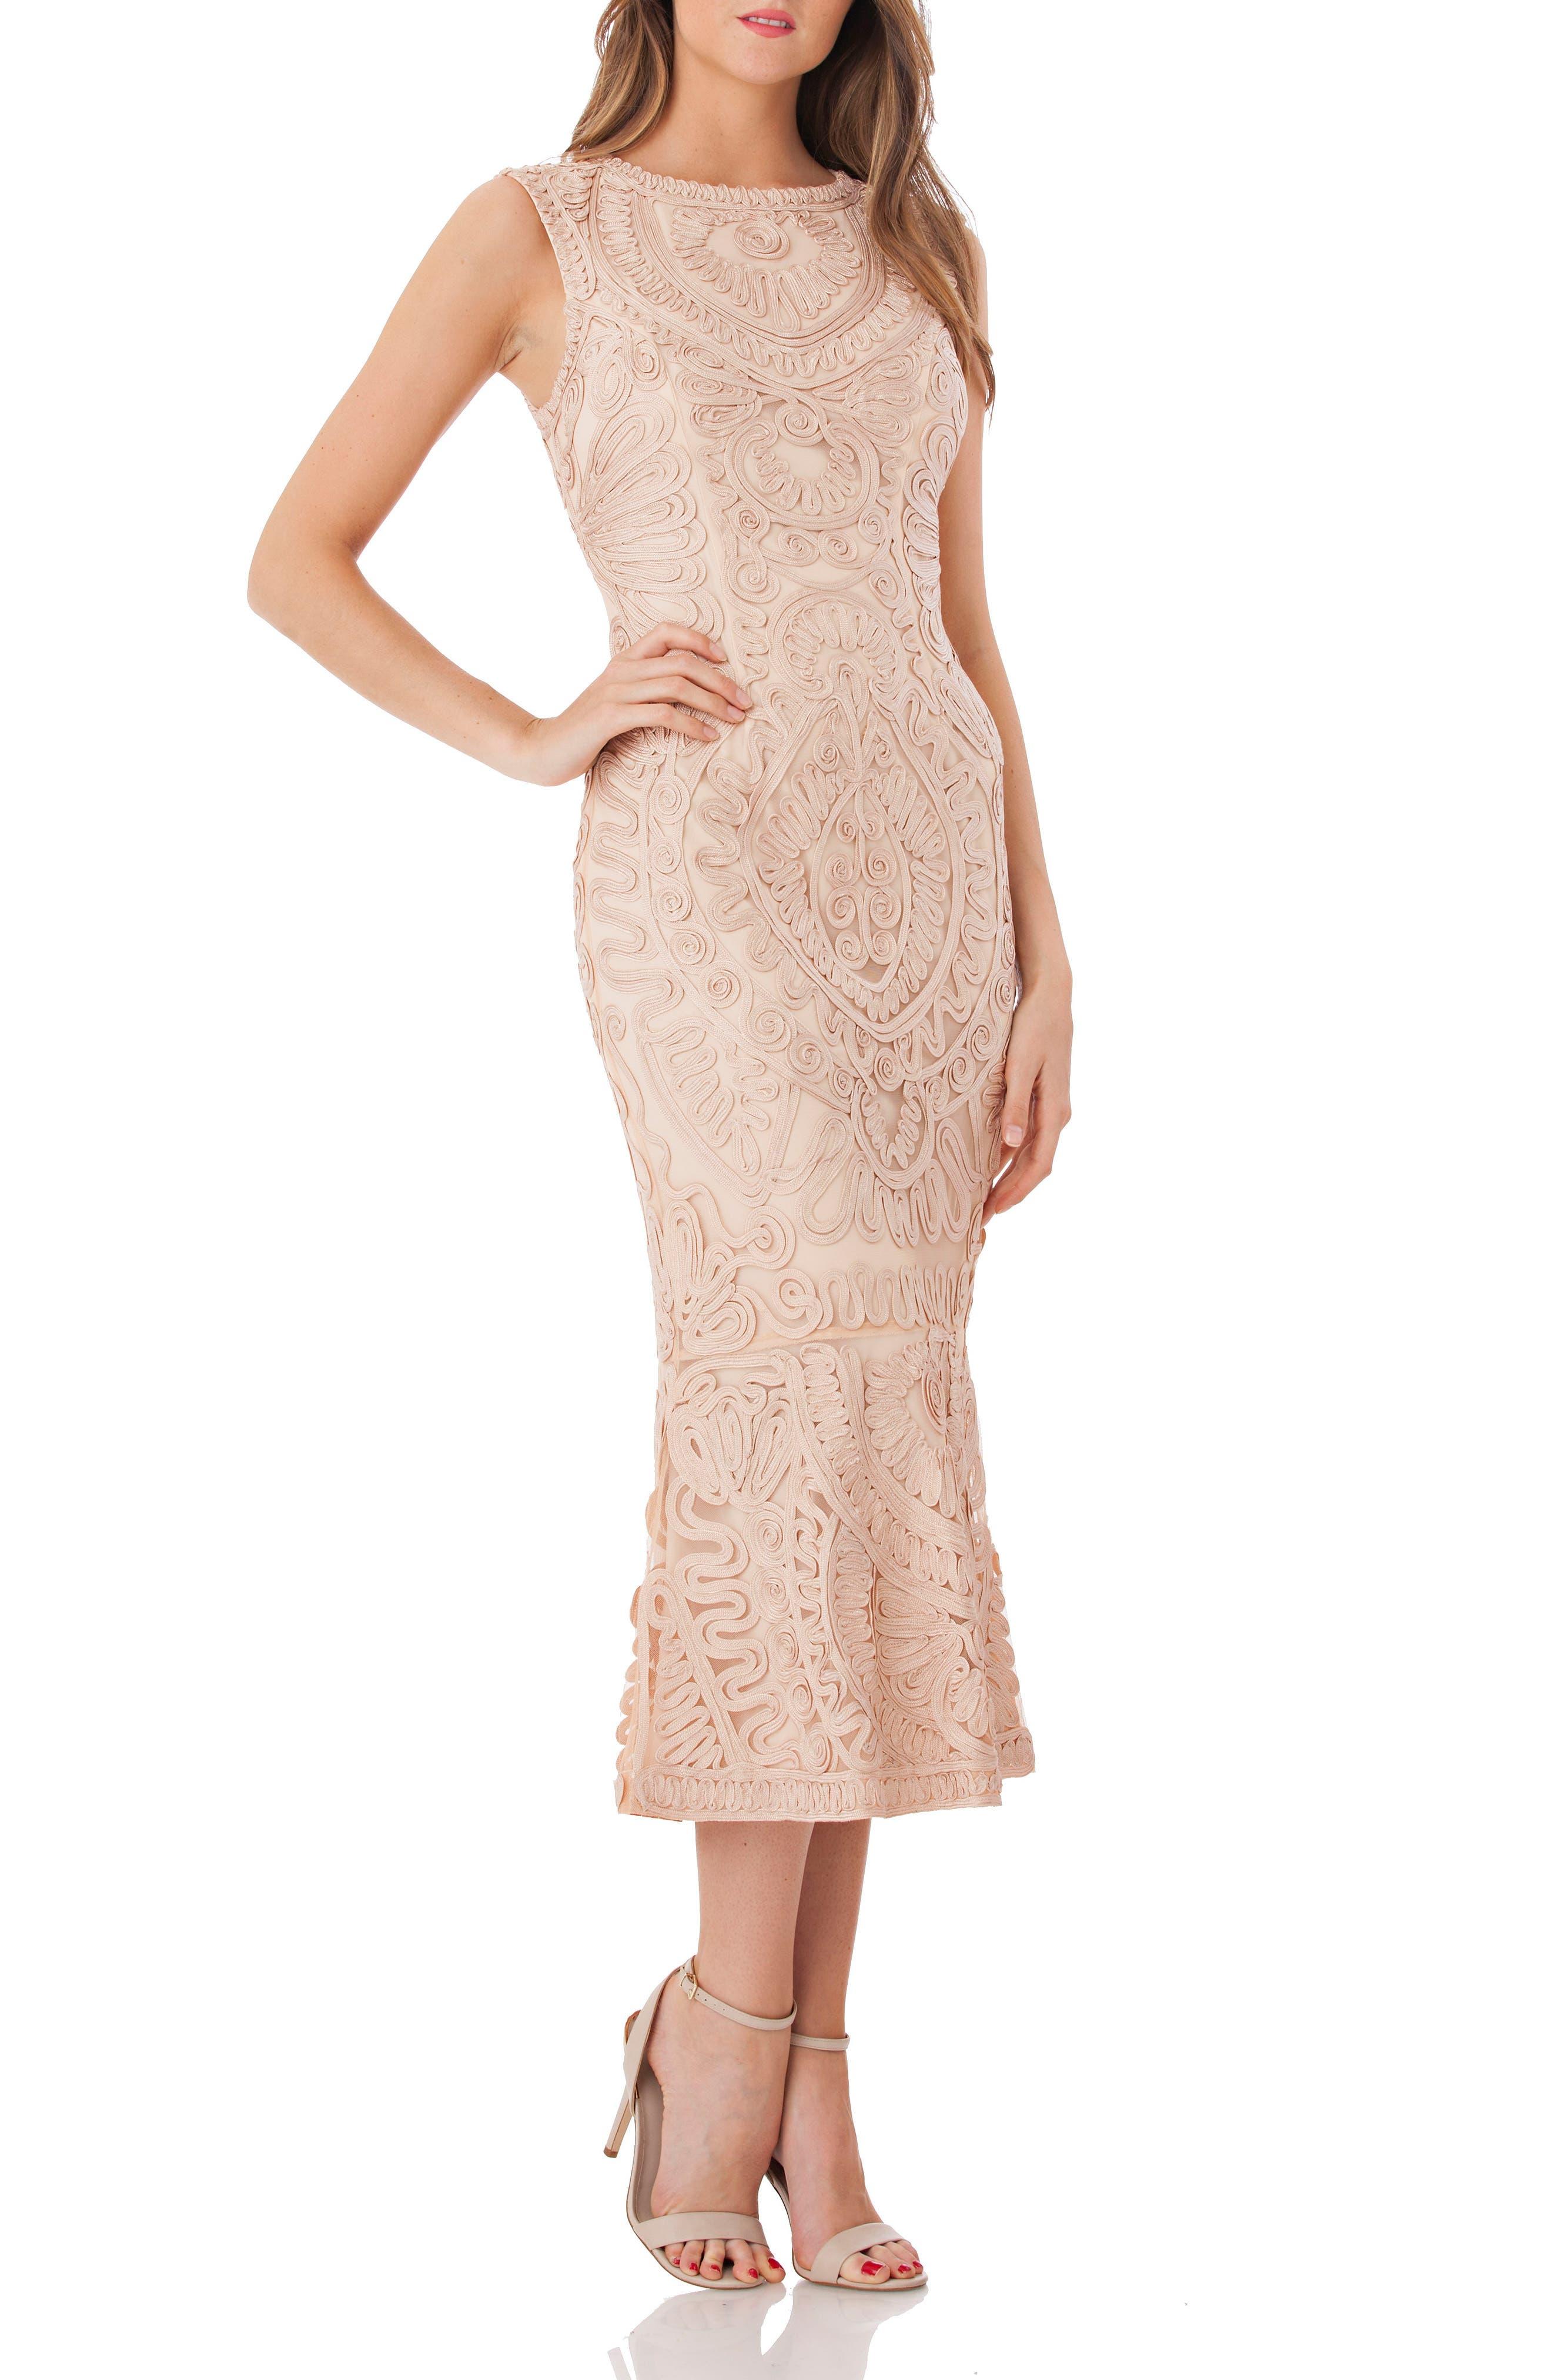 Short Champagne Dress